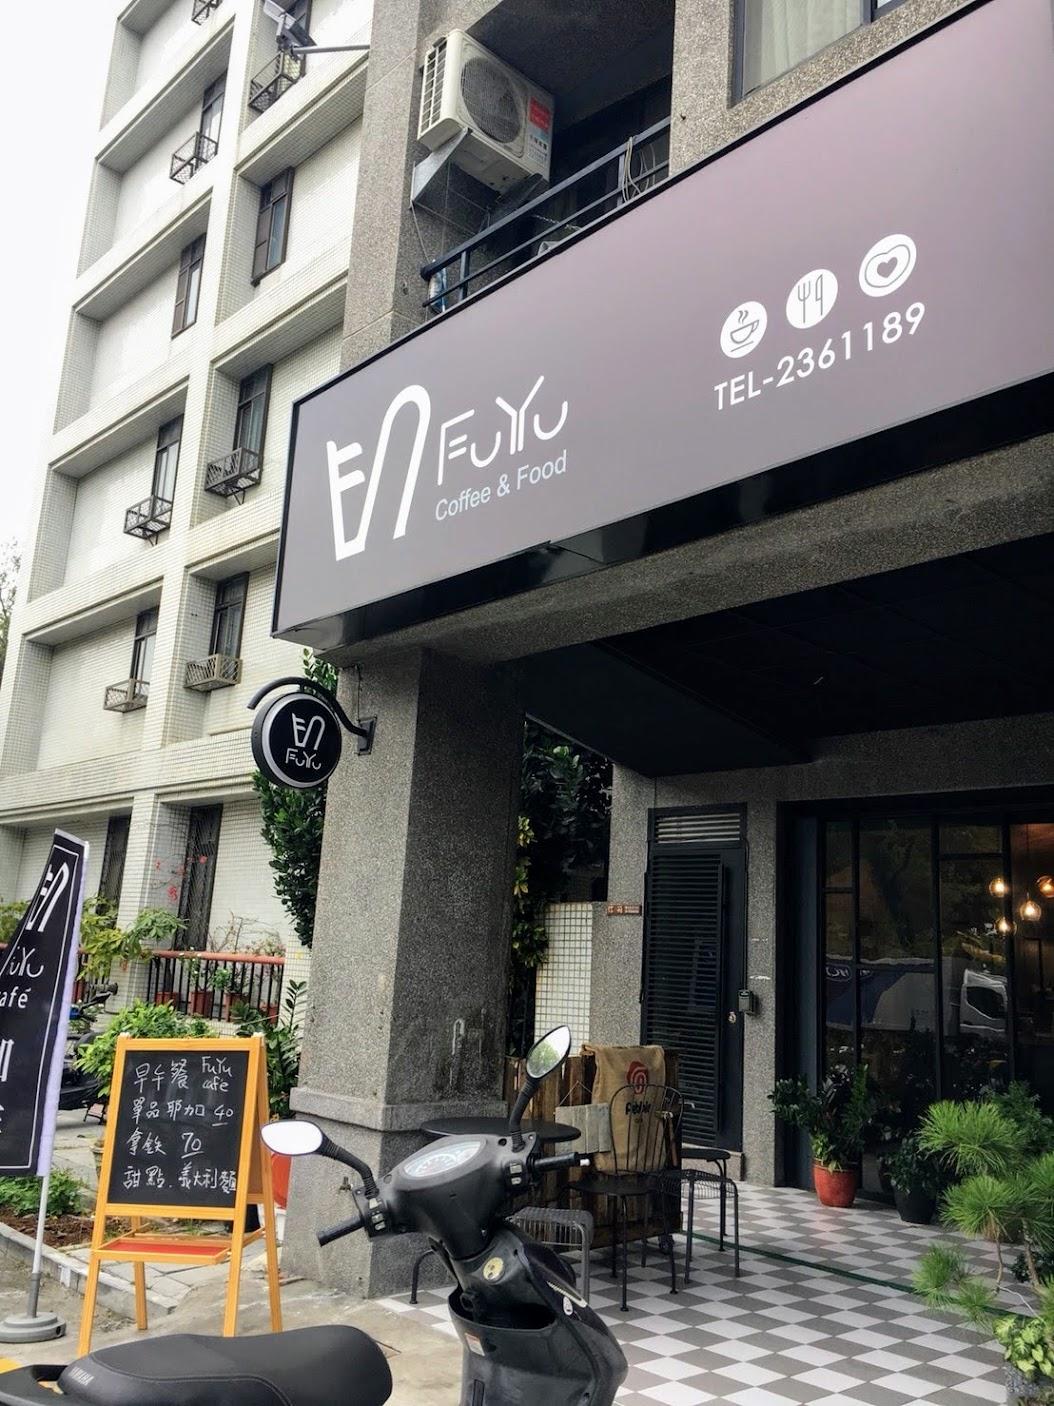 fuyu cafe,長榮路上,成功大學旁,說是馬路旁,實際上經過會忽視掉XD